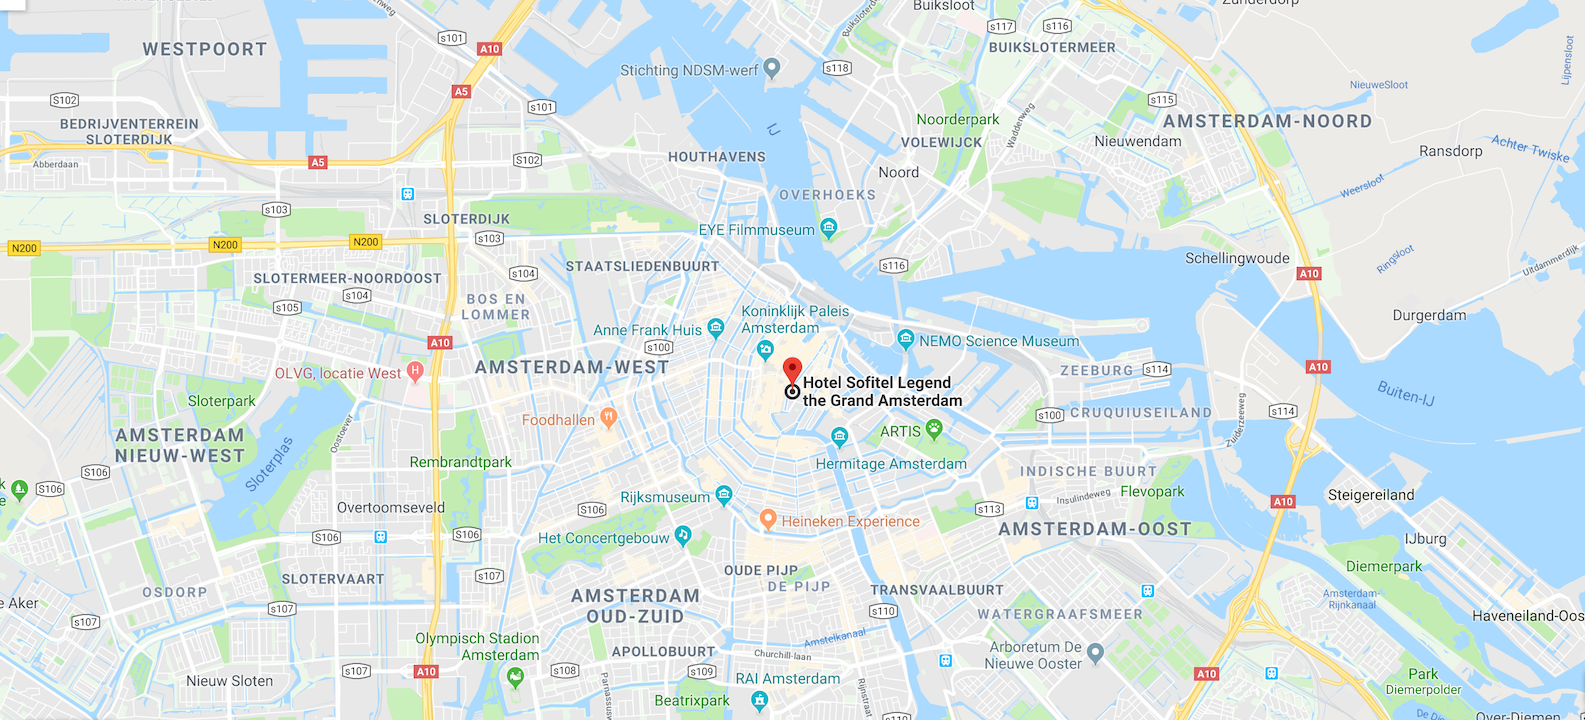 Sofitel Legend Hote The Grand  *****s , Amsterdam / Netherlands